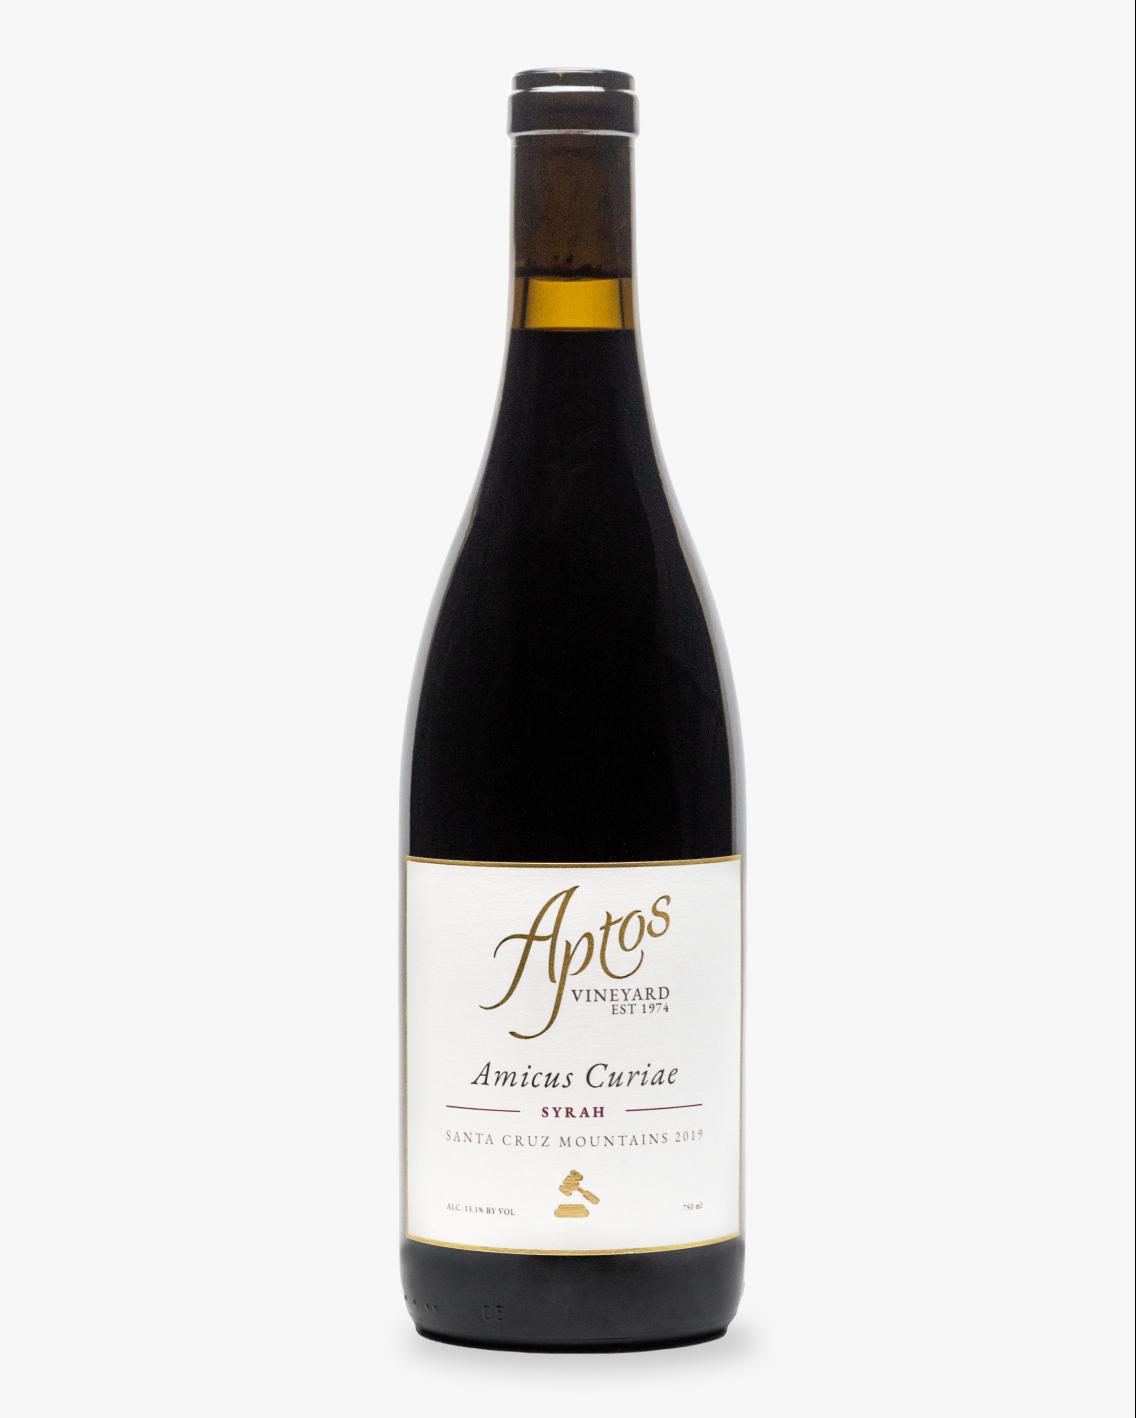 Aptos Vineyard 2019 Syrah bottle of wine